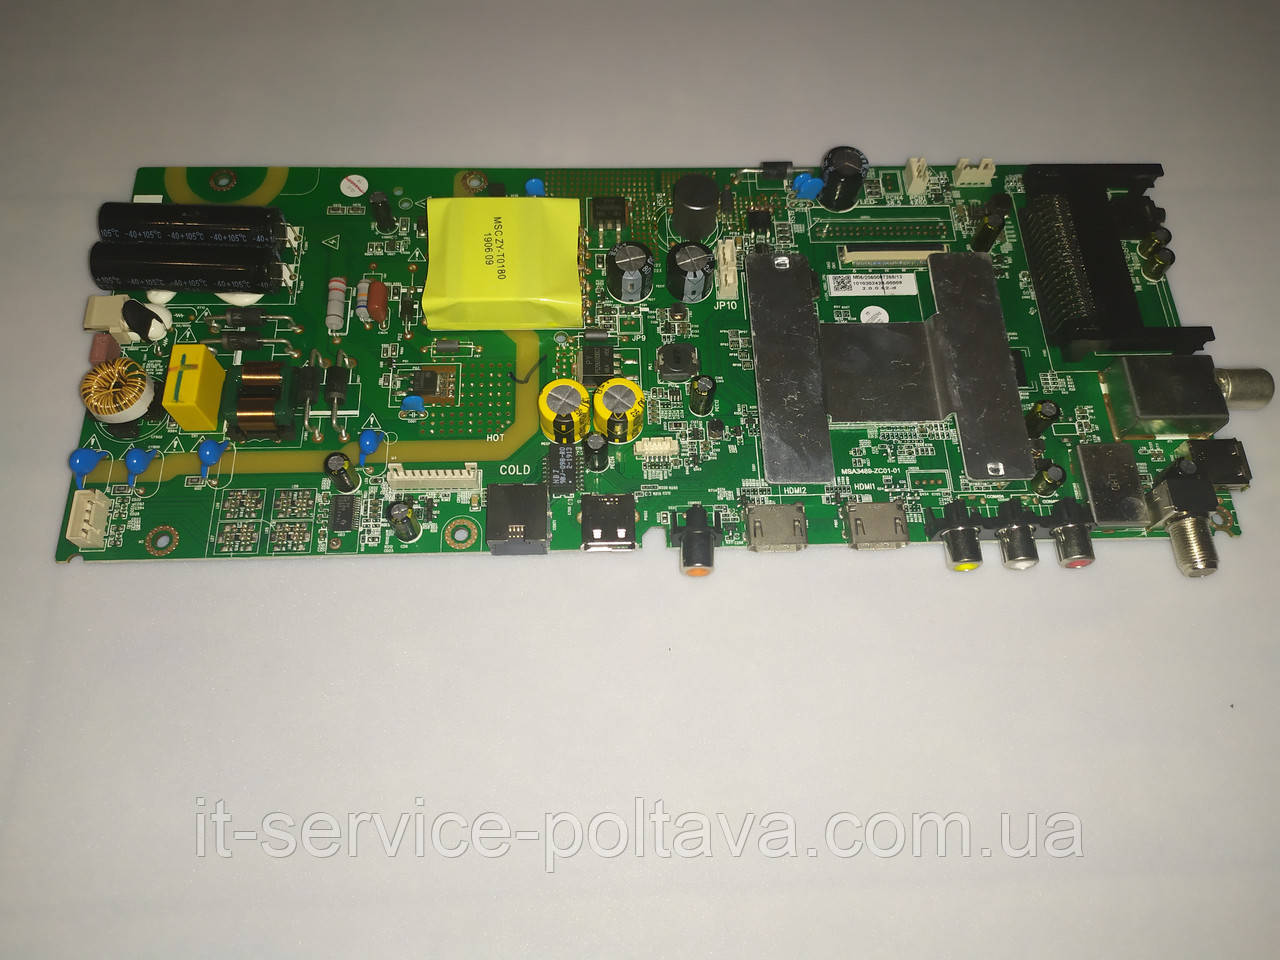 Материнська плата (Main board) MSA3489-ZC01-01 для телевізора STRONG